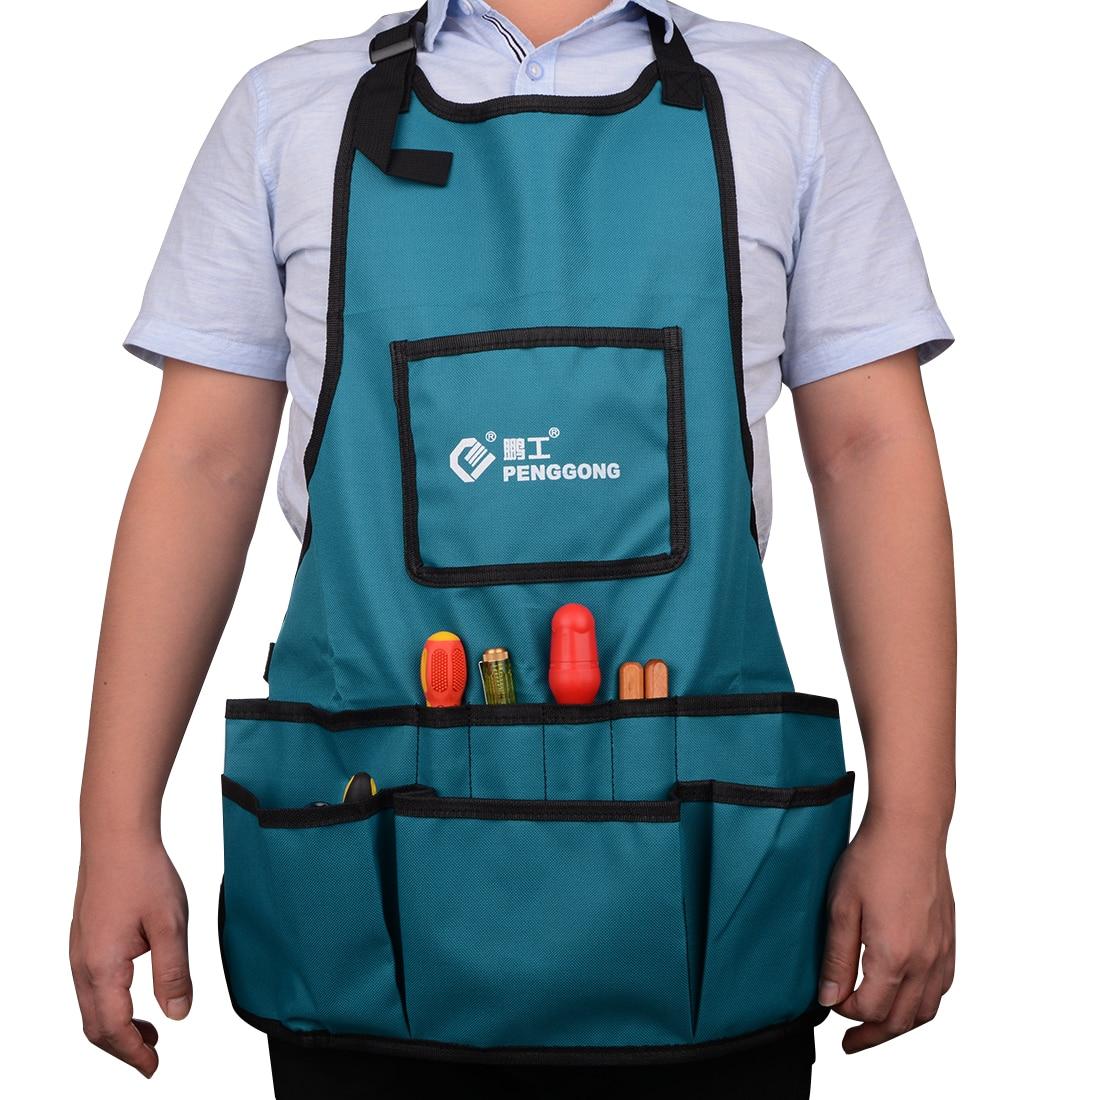 Hardware Kit Bag Tool Bags Garden Bag Multi-Purpose Garden Tool Apron With Multifunction Pockets